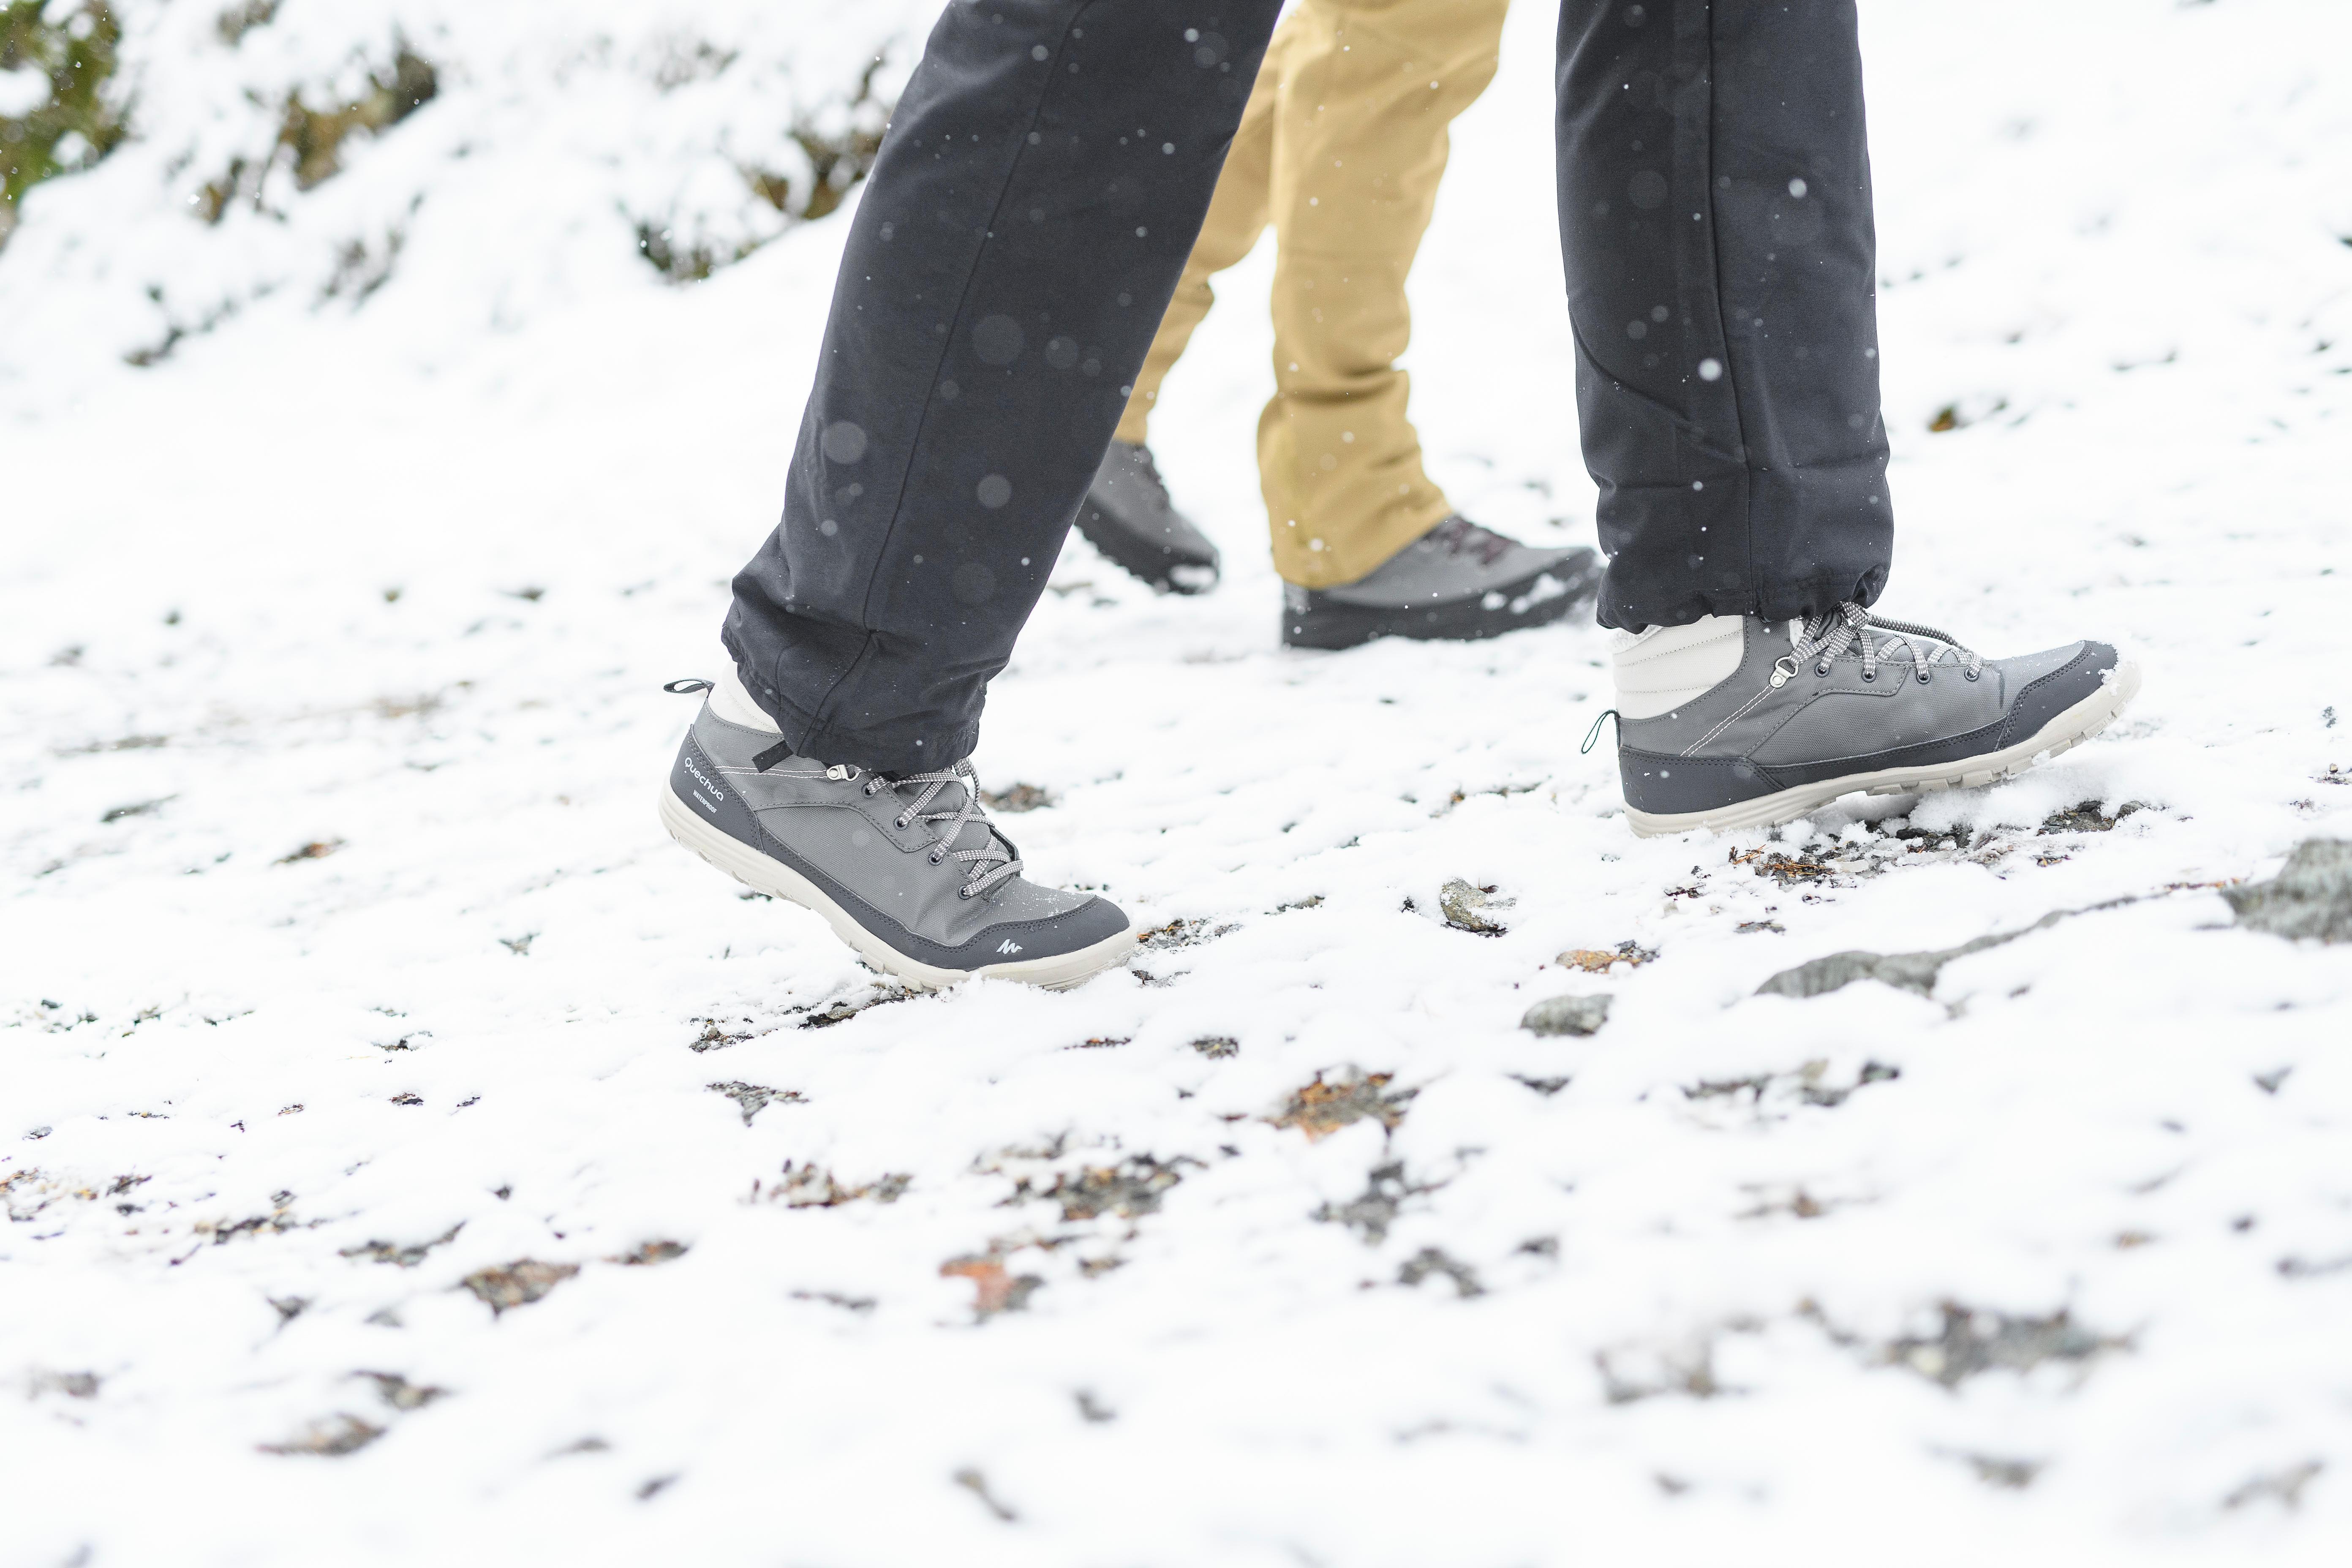 Chaussures randonée neige